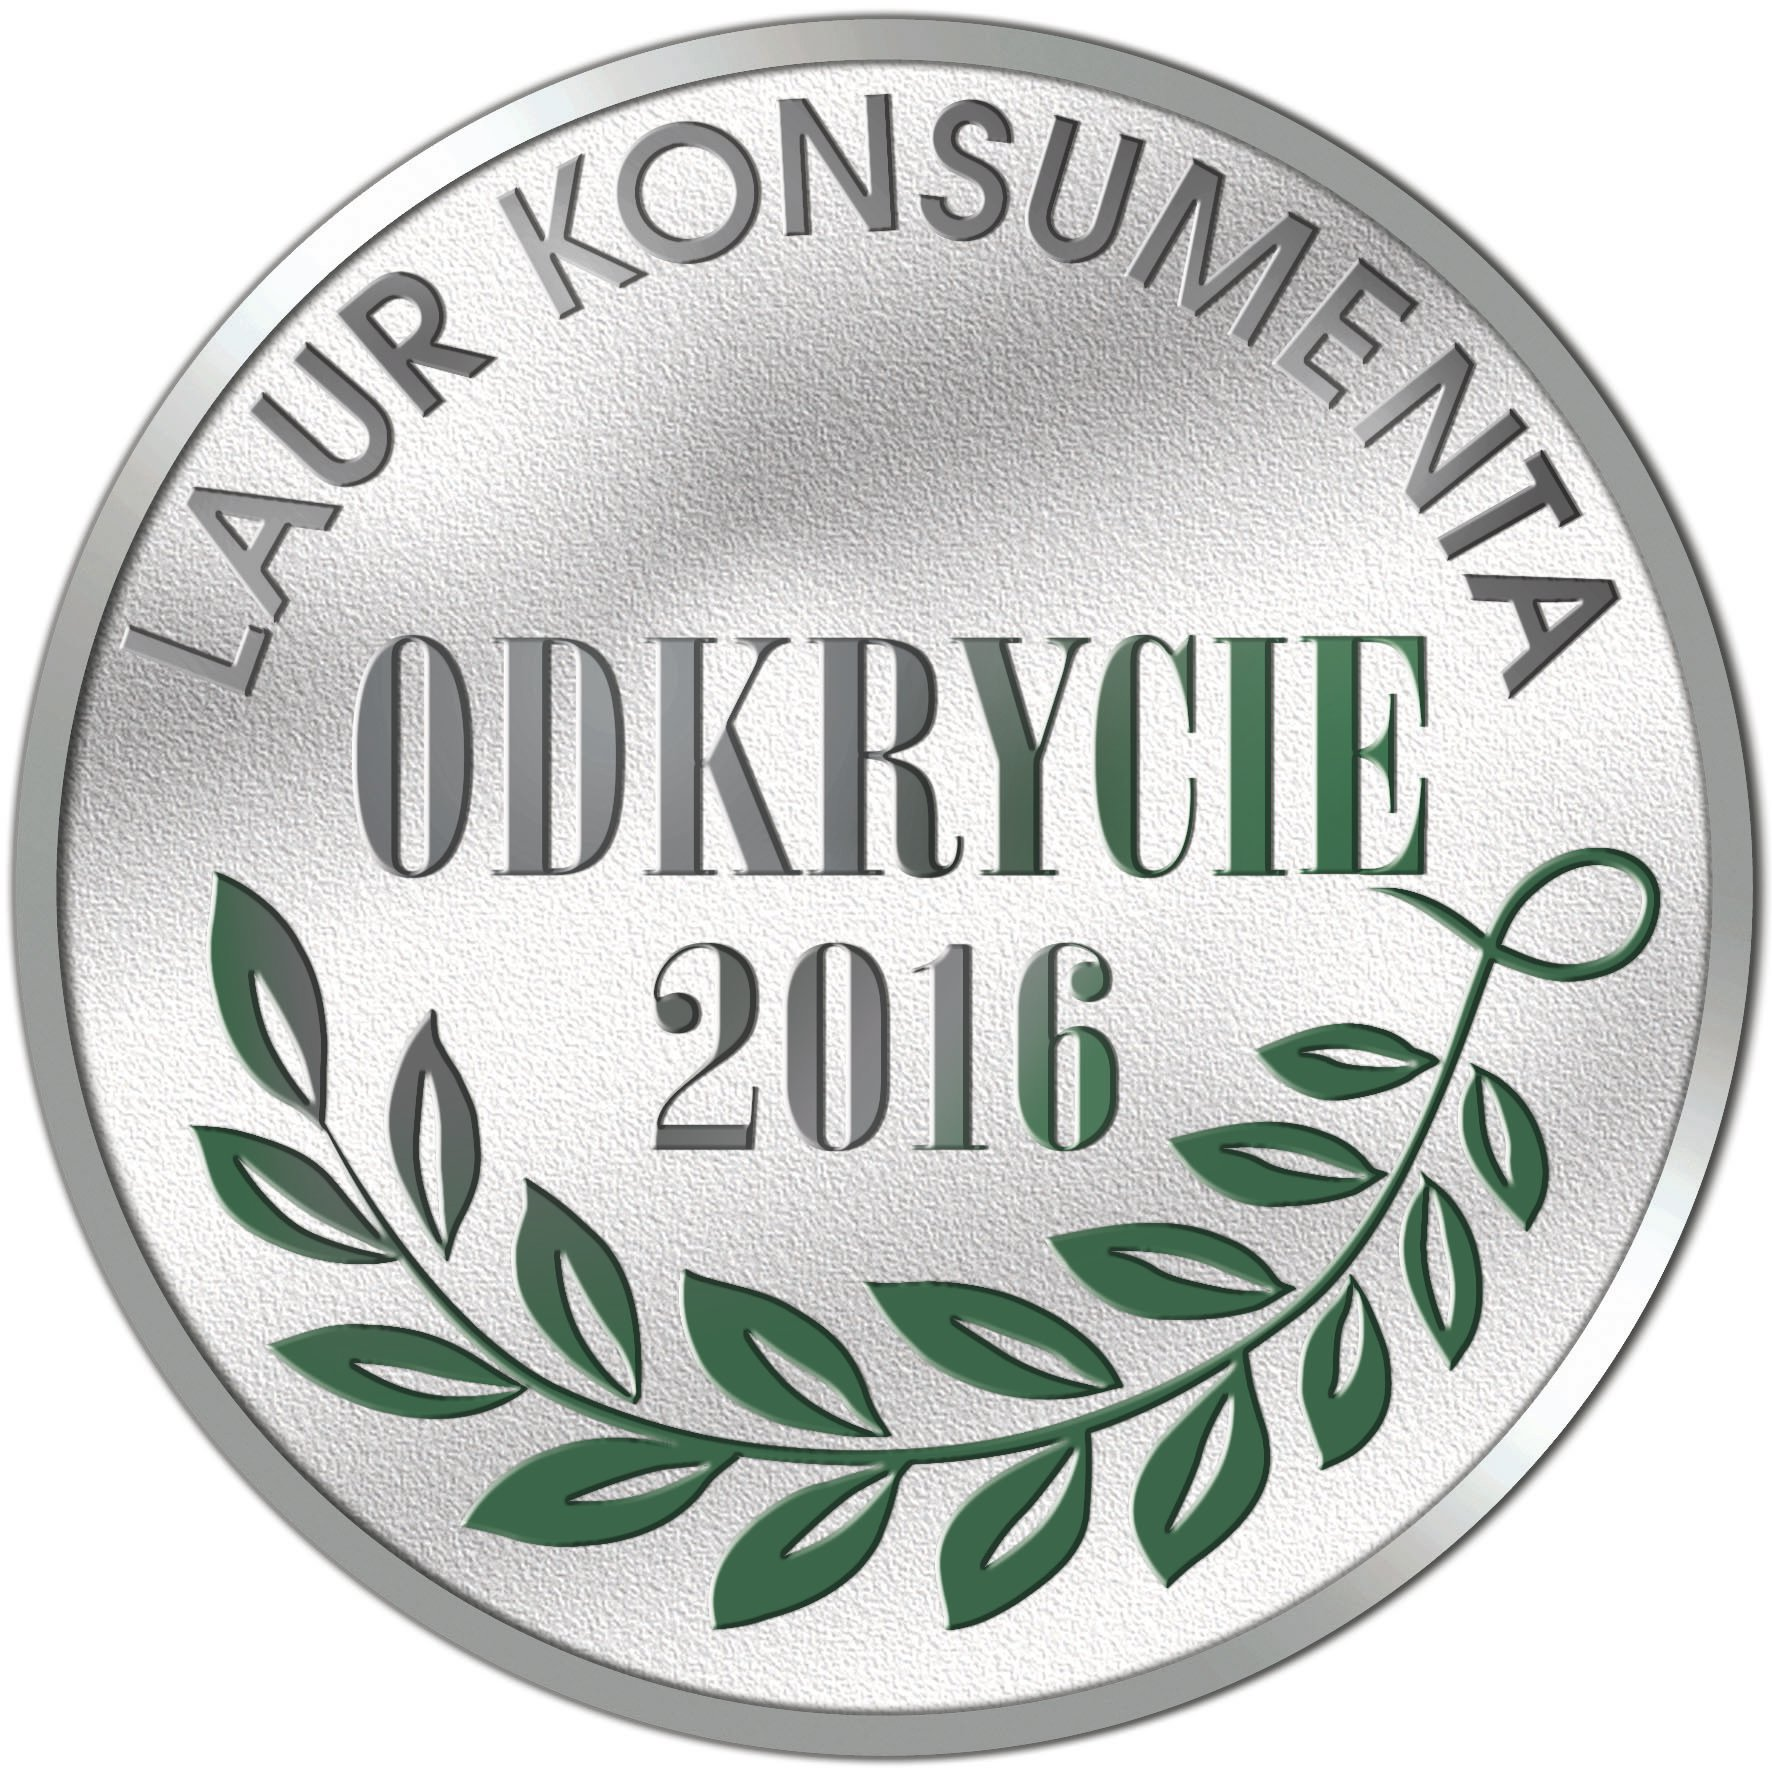 Logo laur konsumenta odkrycie 2016